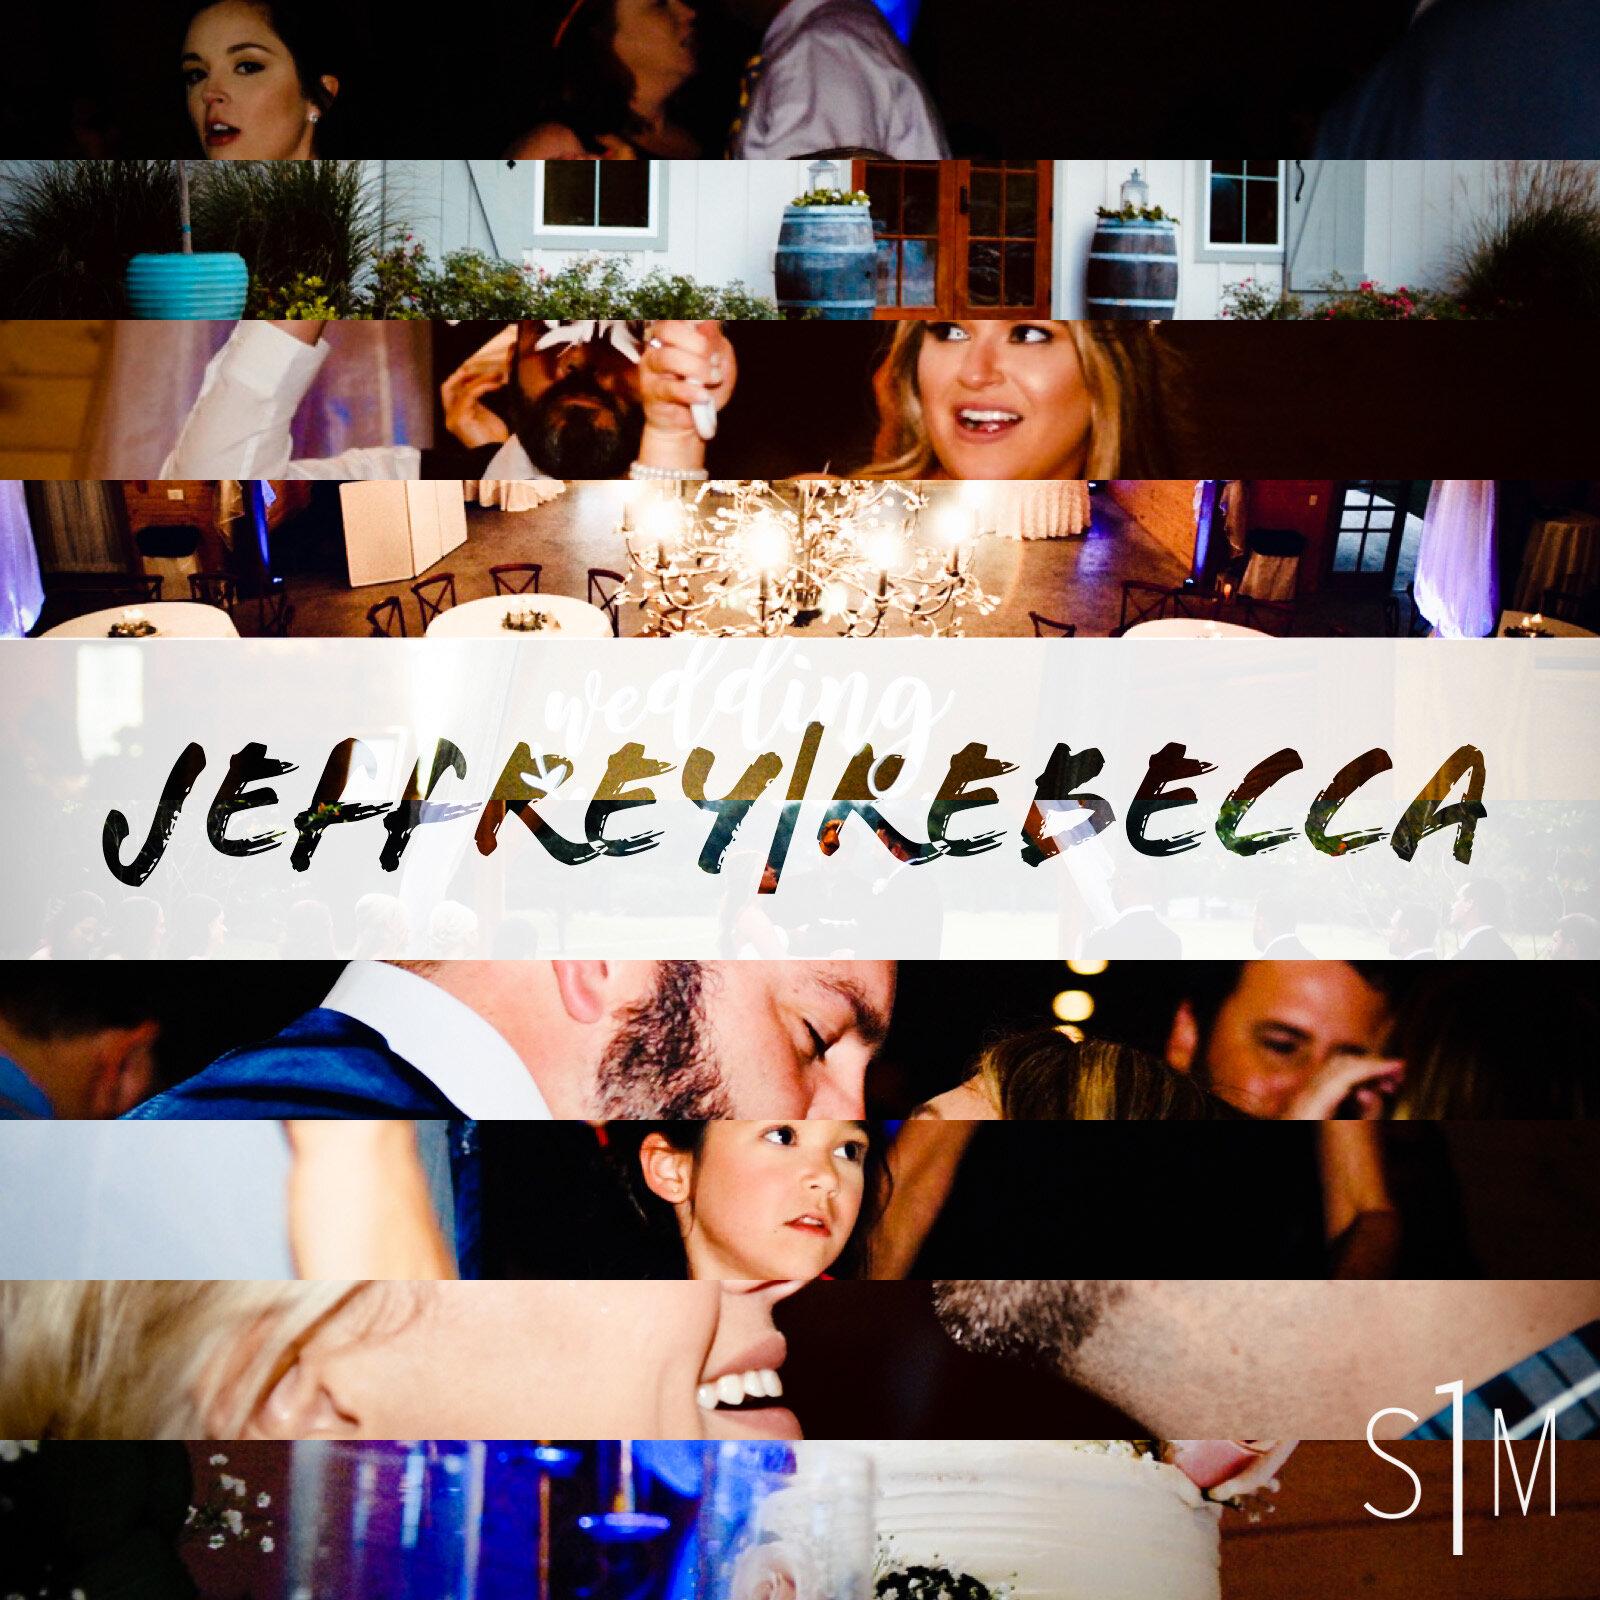 - Apple Music Playlist of Jeffrey and Rebecca's Wedding